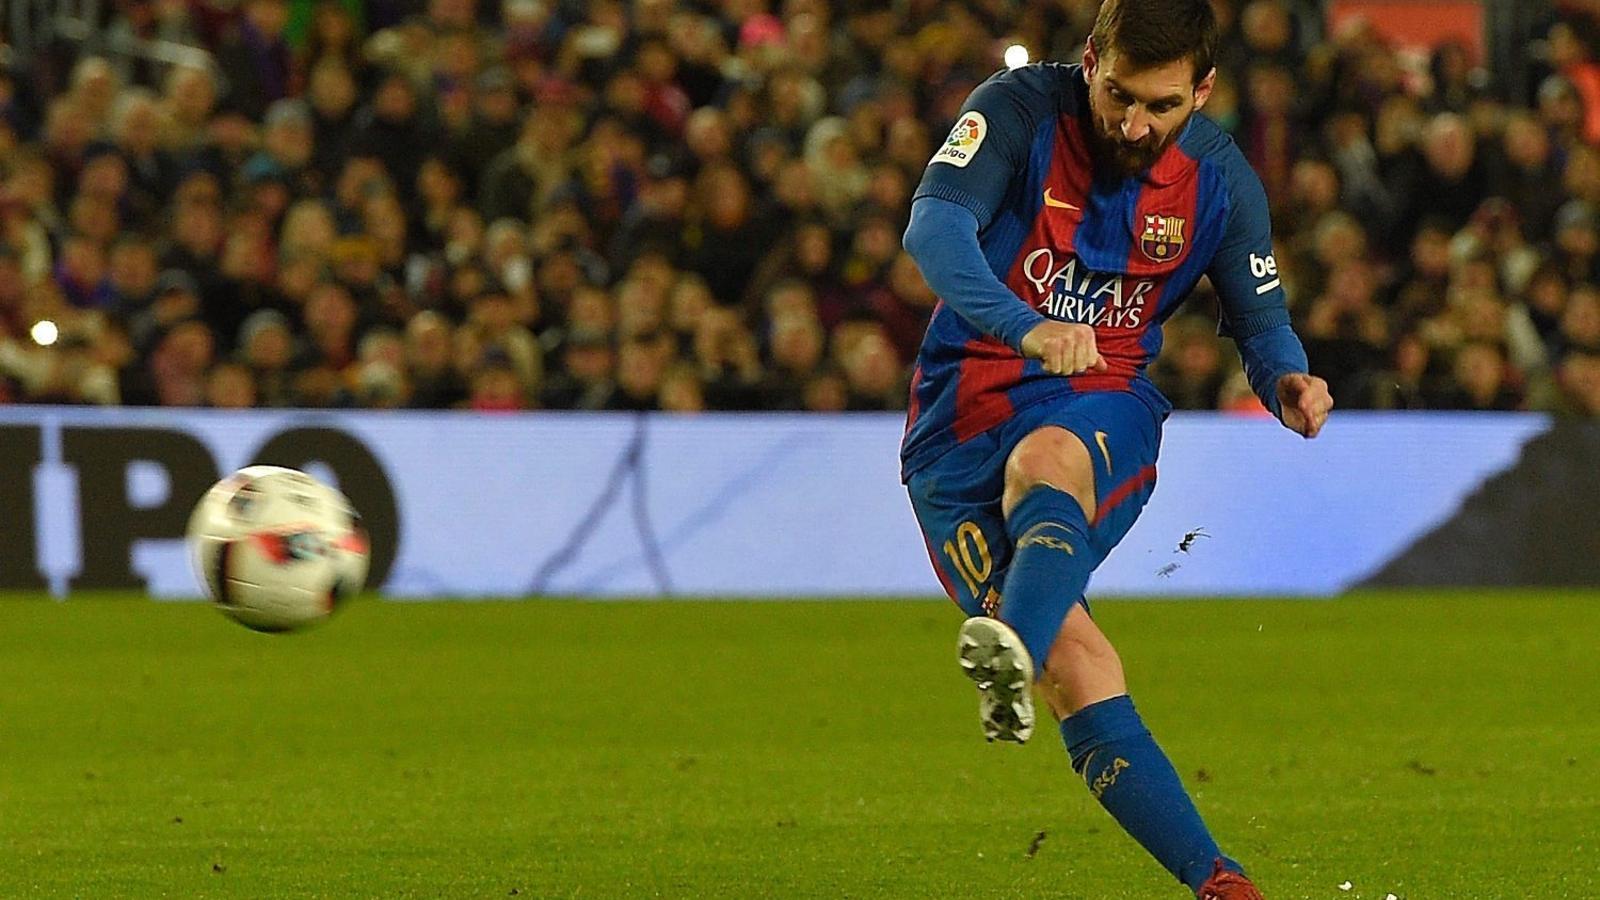 La creueta preferida  de Leo Messi